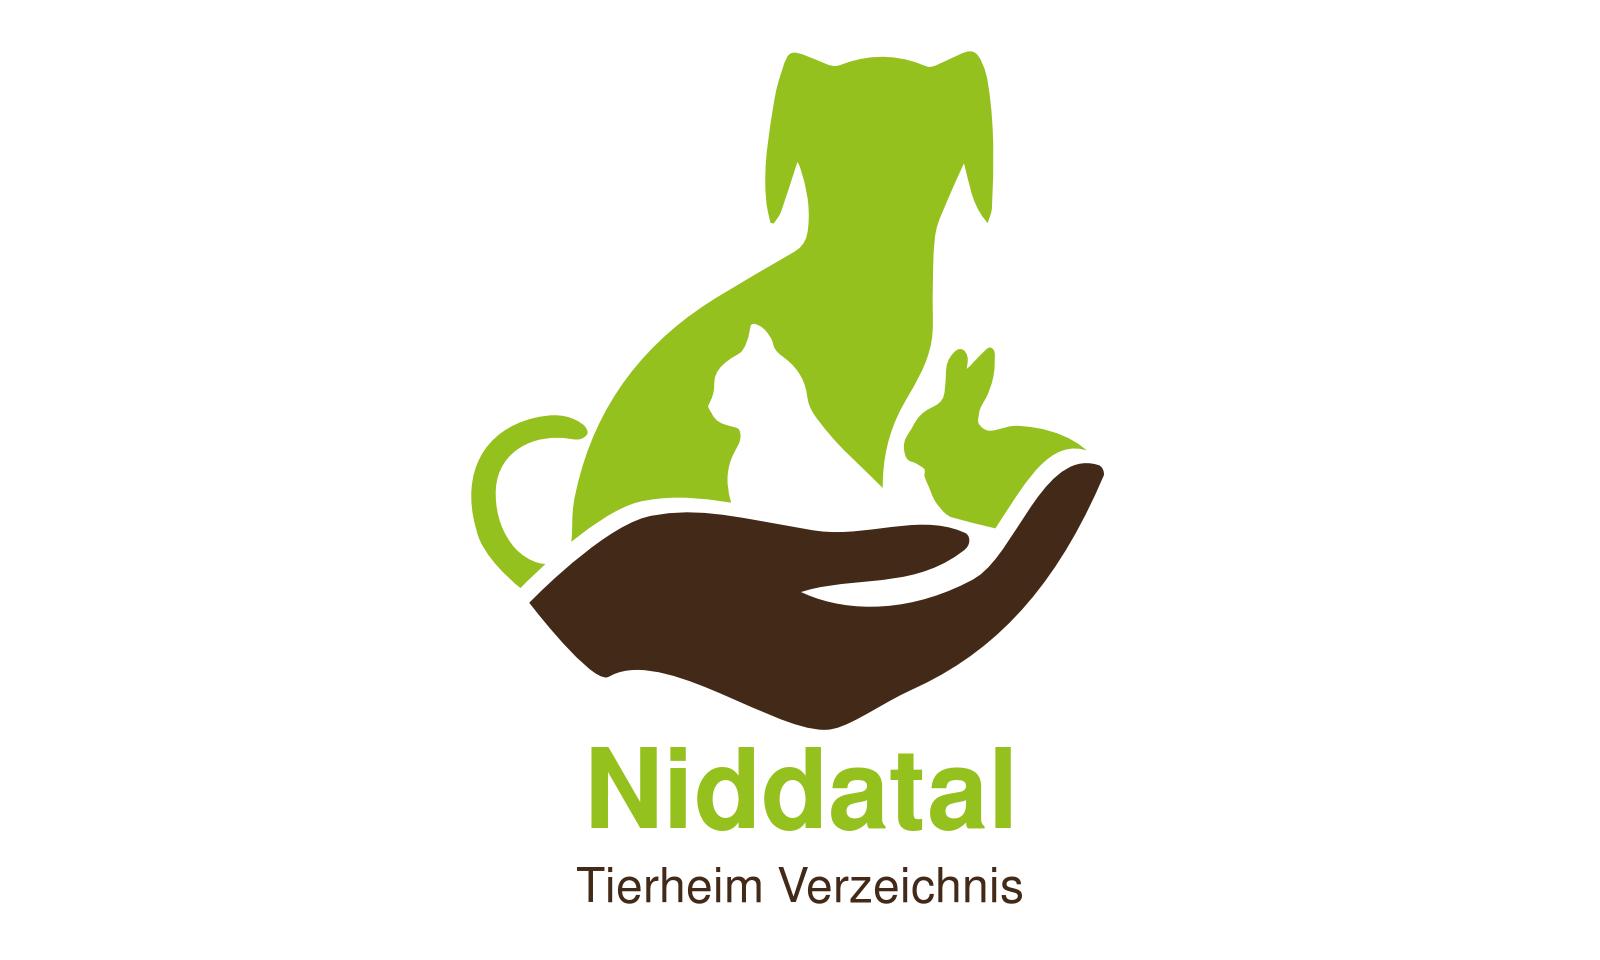 Tierheim Niddatal